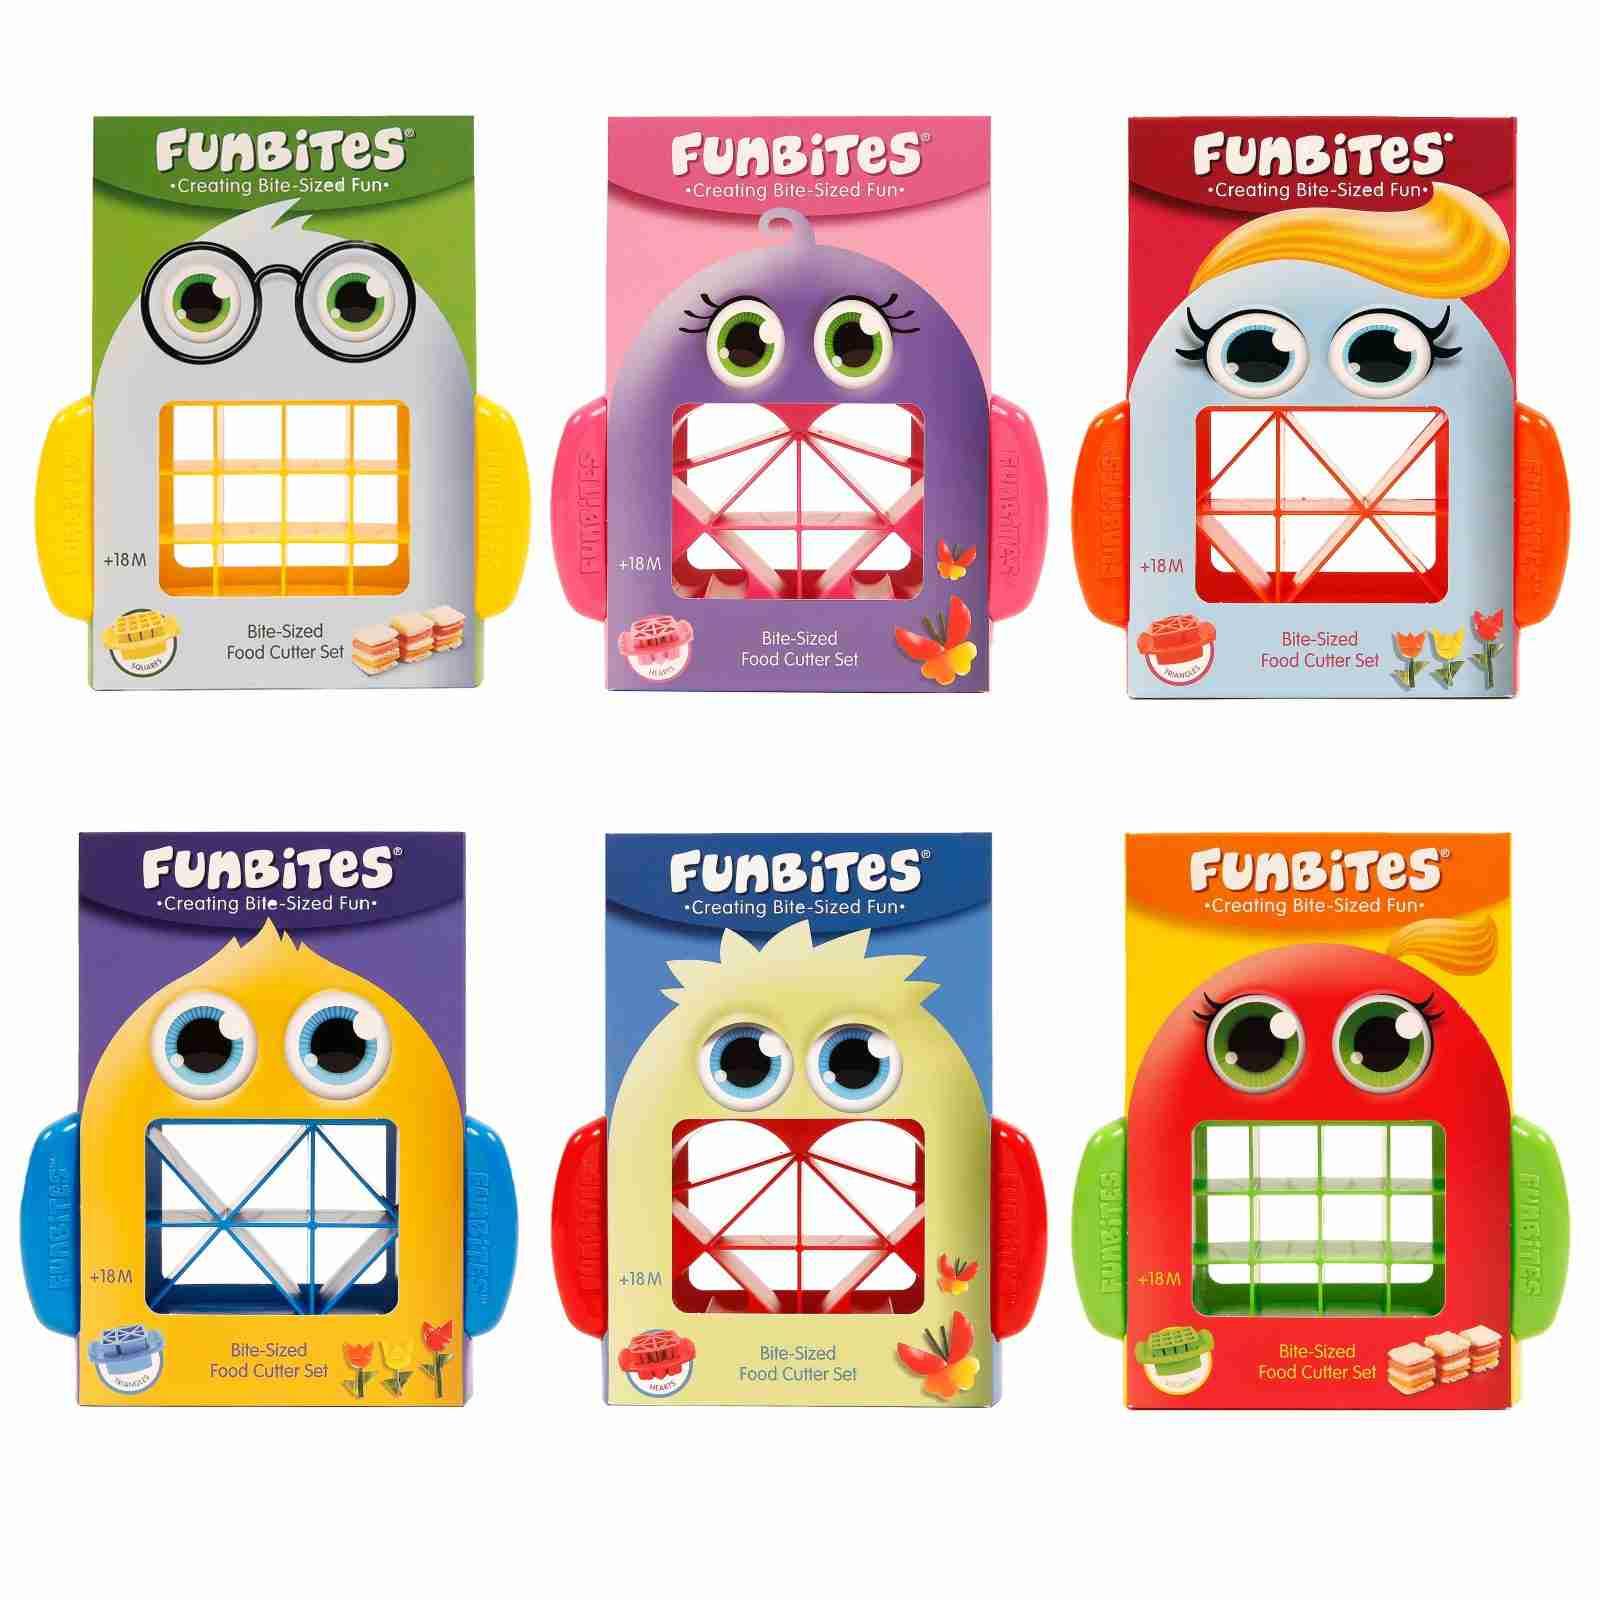 FunBites - Packaged